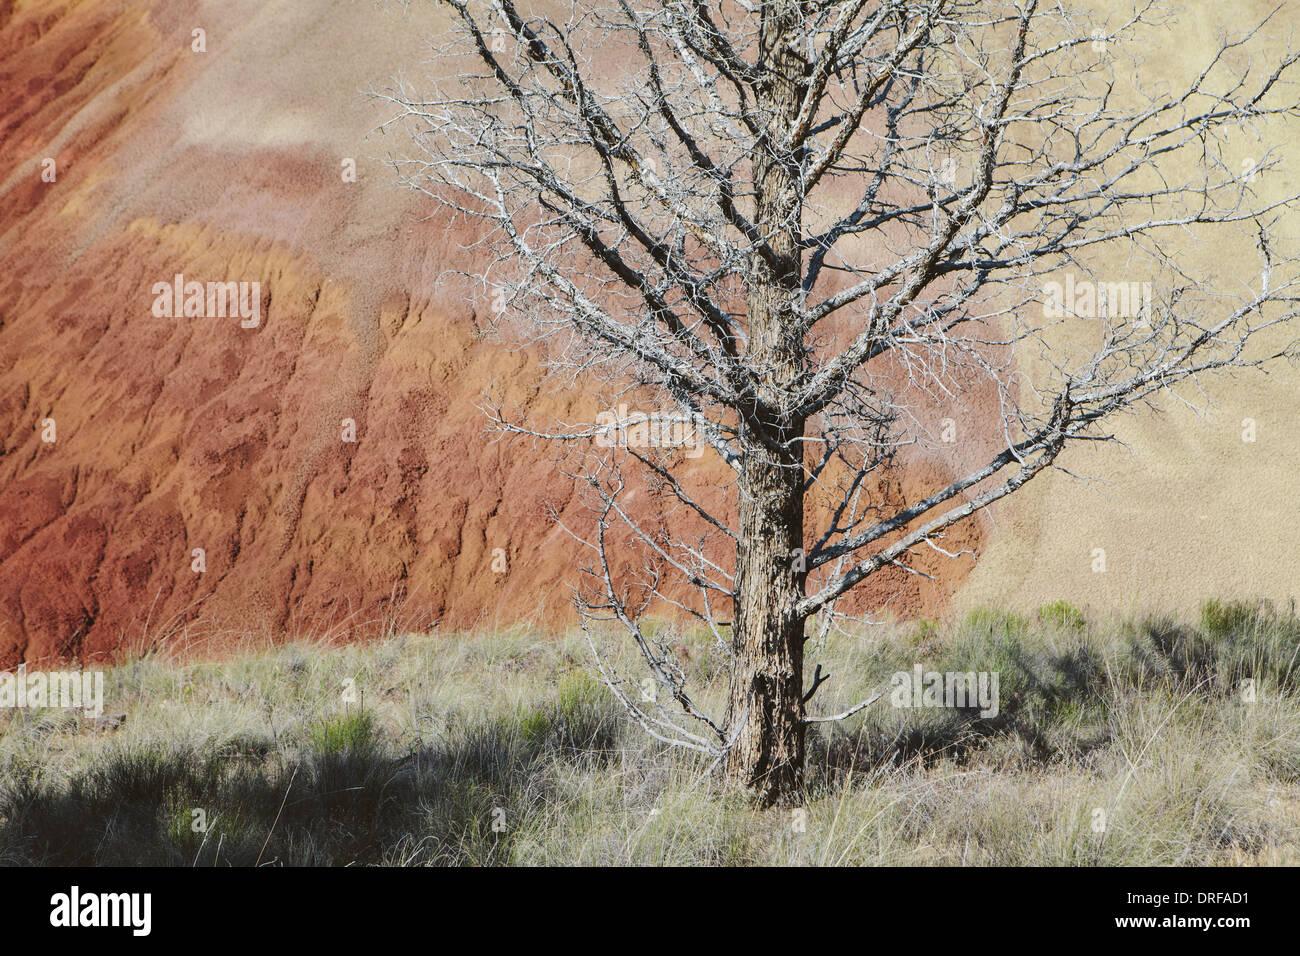 Oregon USA entre árbol desnudo paisaje geológico volcánico Imagen De Stock